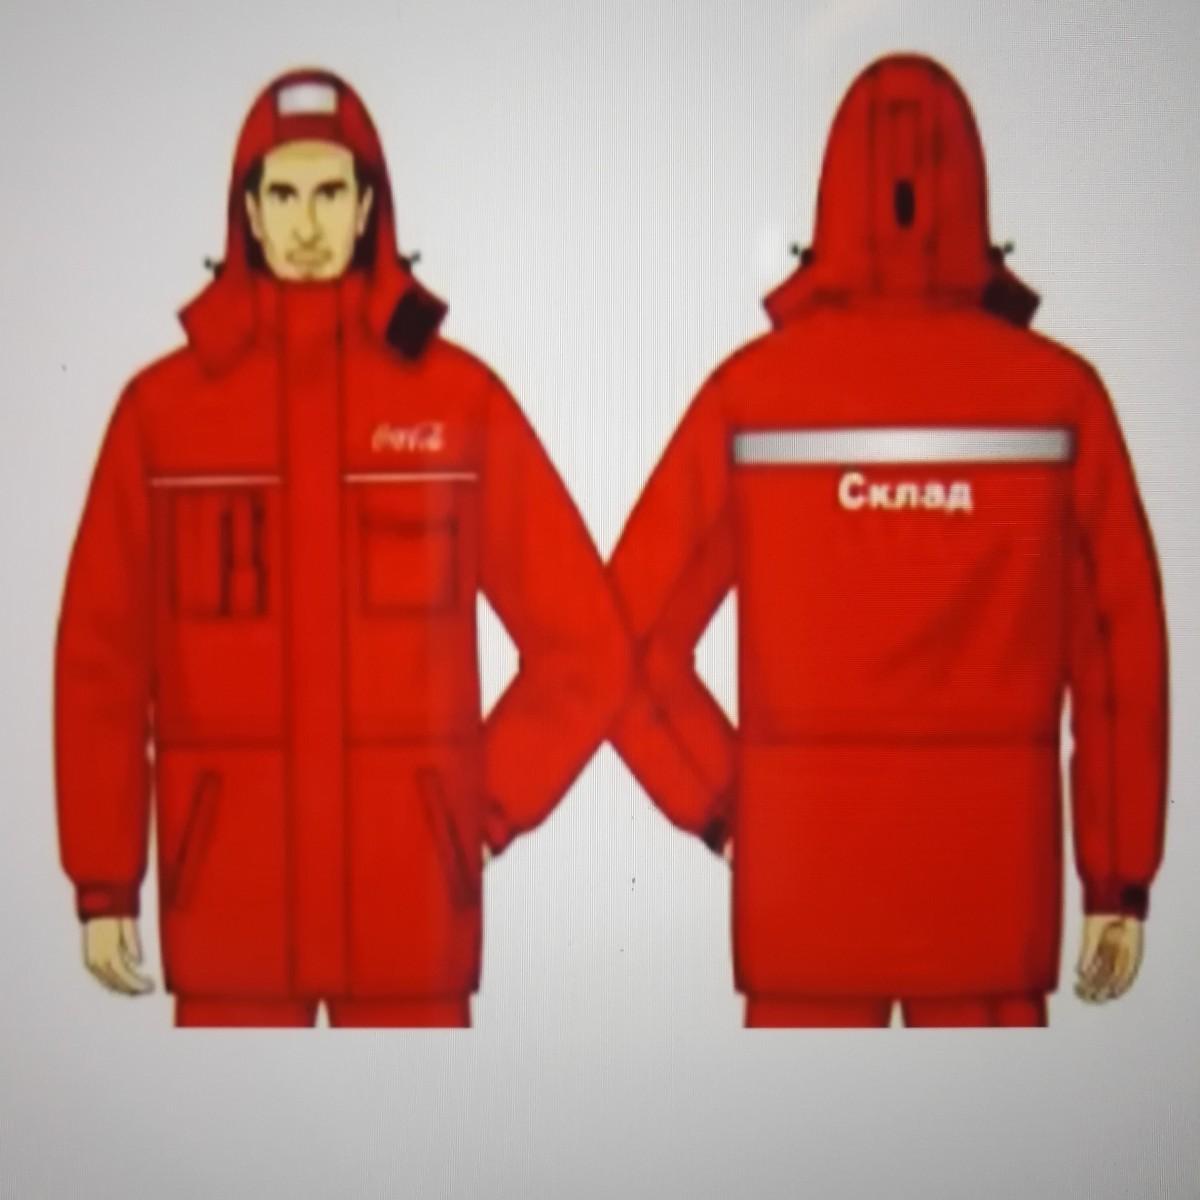 Куртка сменная для ИТР мужская, ХЛ35/ПЭ65, красная